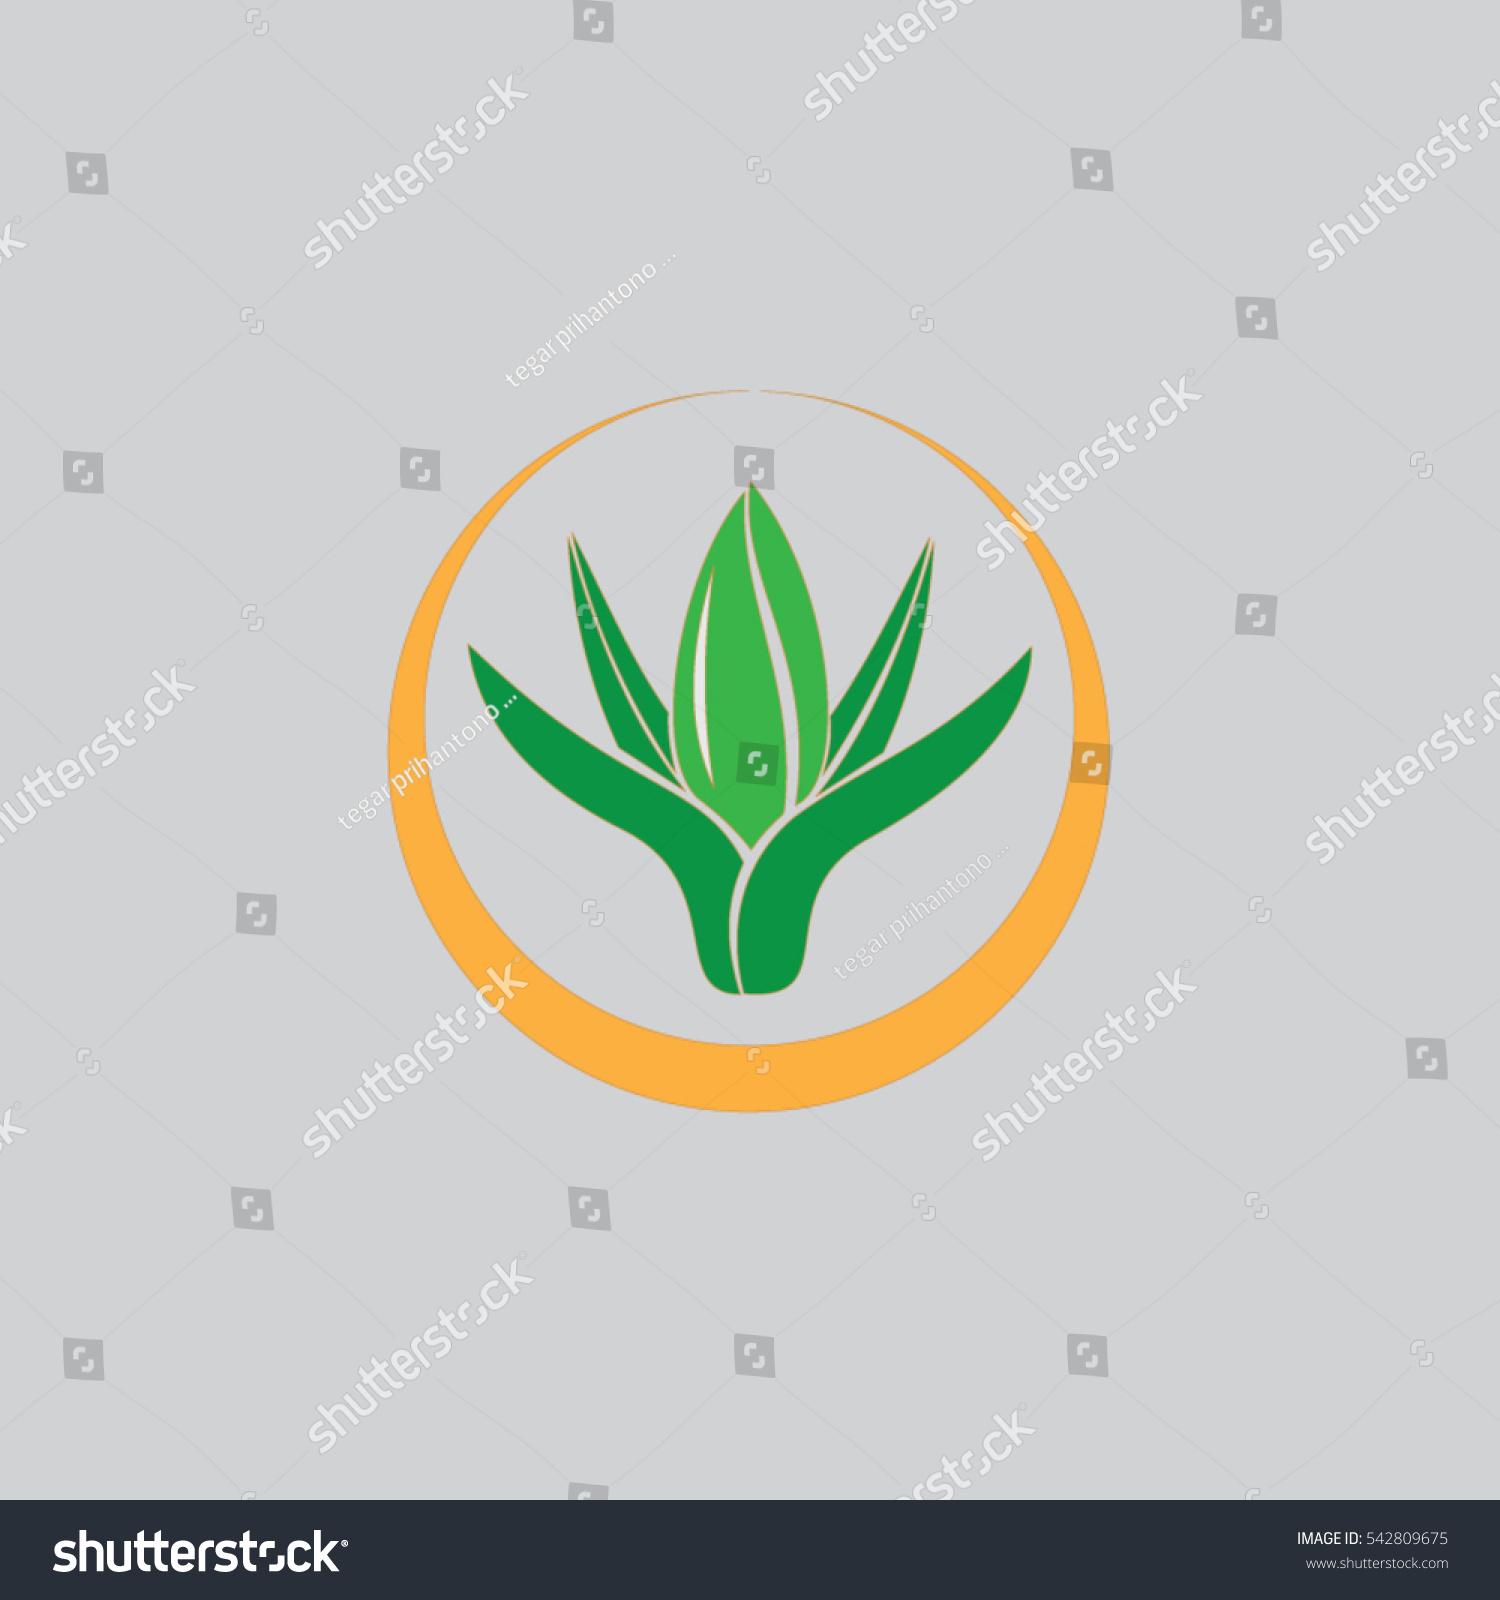 Leaf Ellipse Art Logo Hand Stock Vector (Royalty Free) 542809675 ...